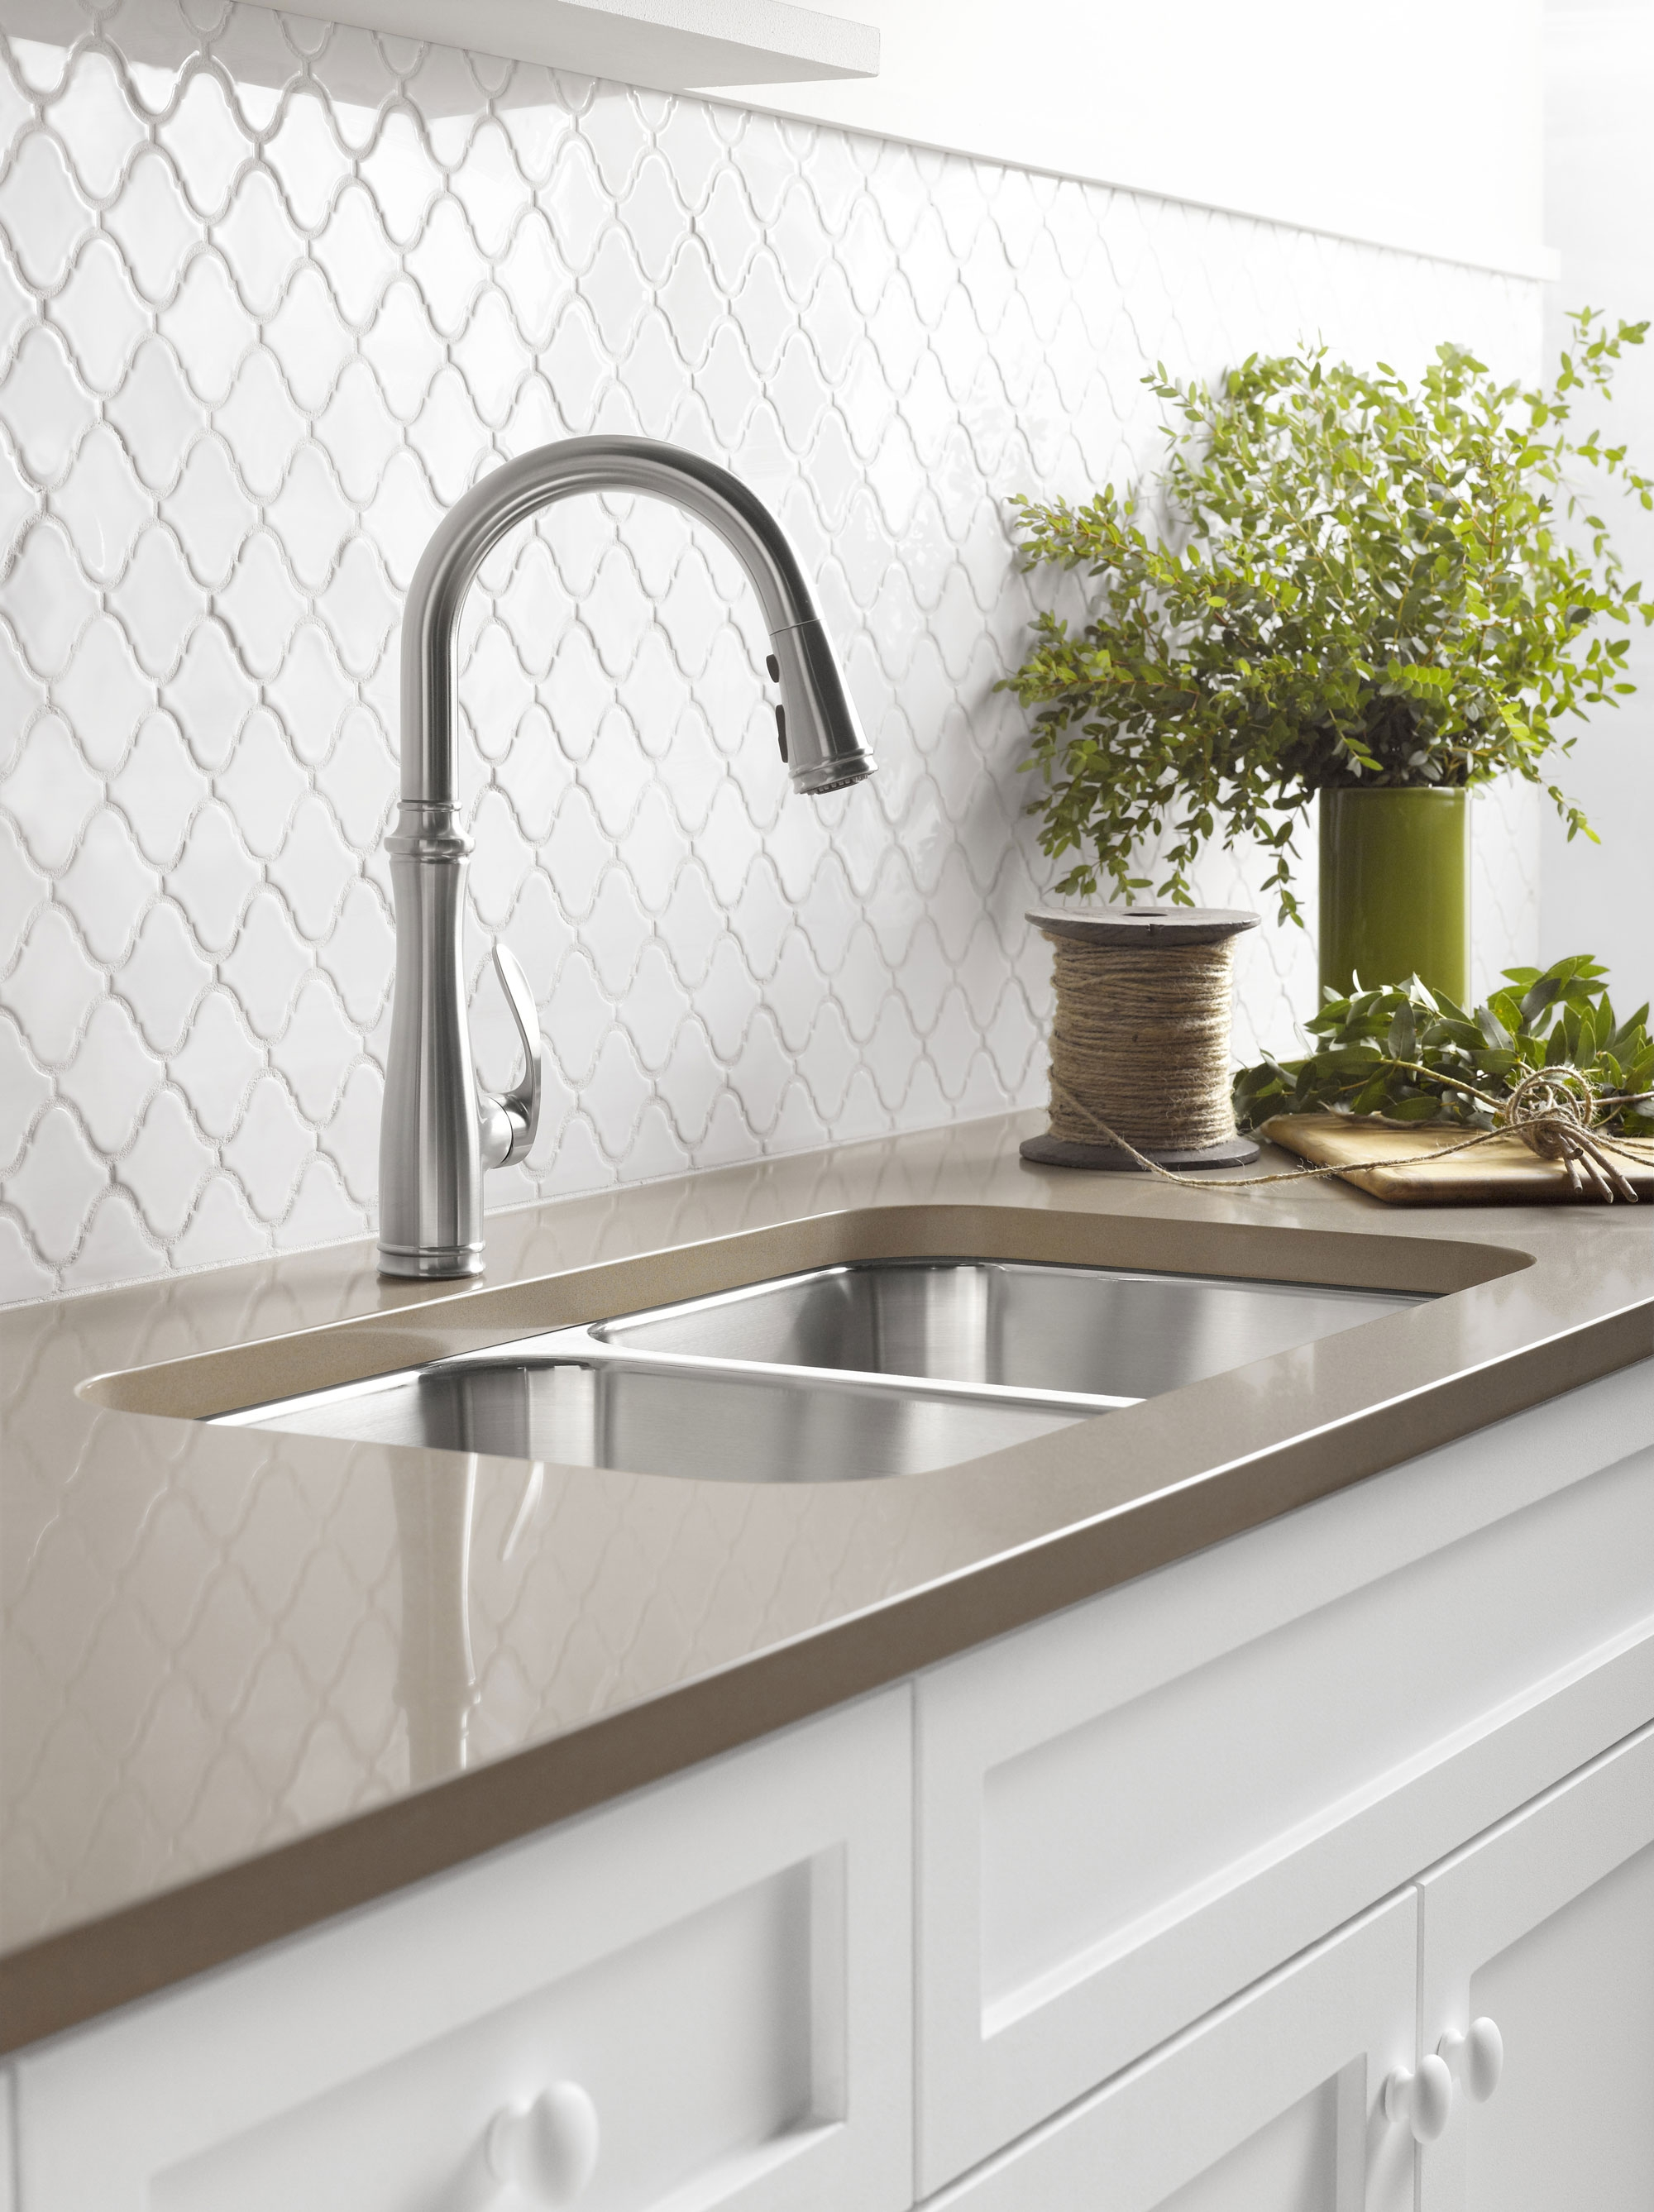 Ideas, kohler elliston faucet brushed nickel kohler elliston faucet brushed nickel decorating farmhouse faucet kitchen kitchen sink faucet with 2000 x 2675  .